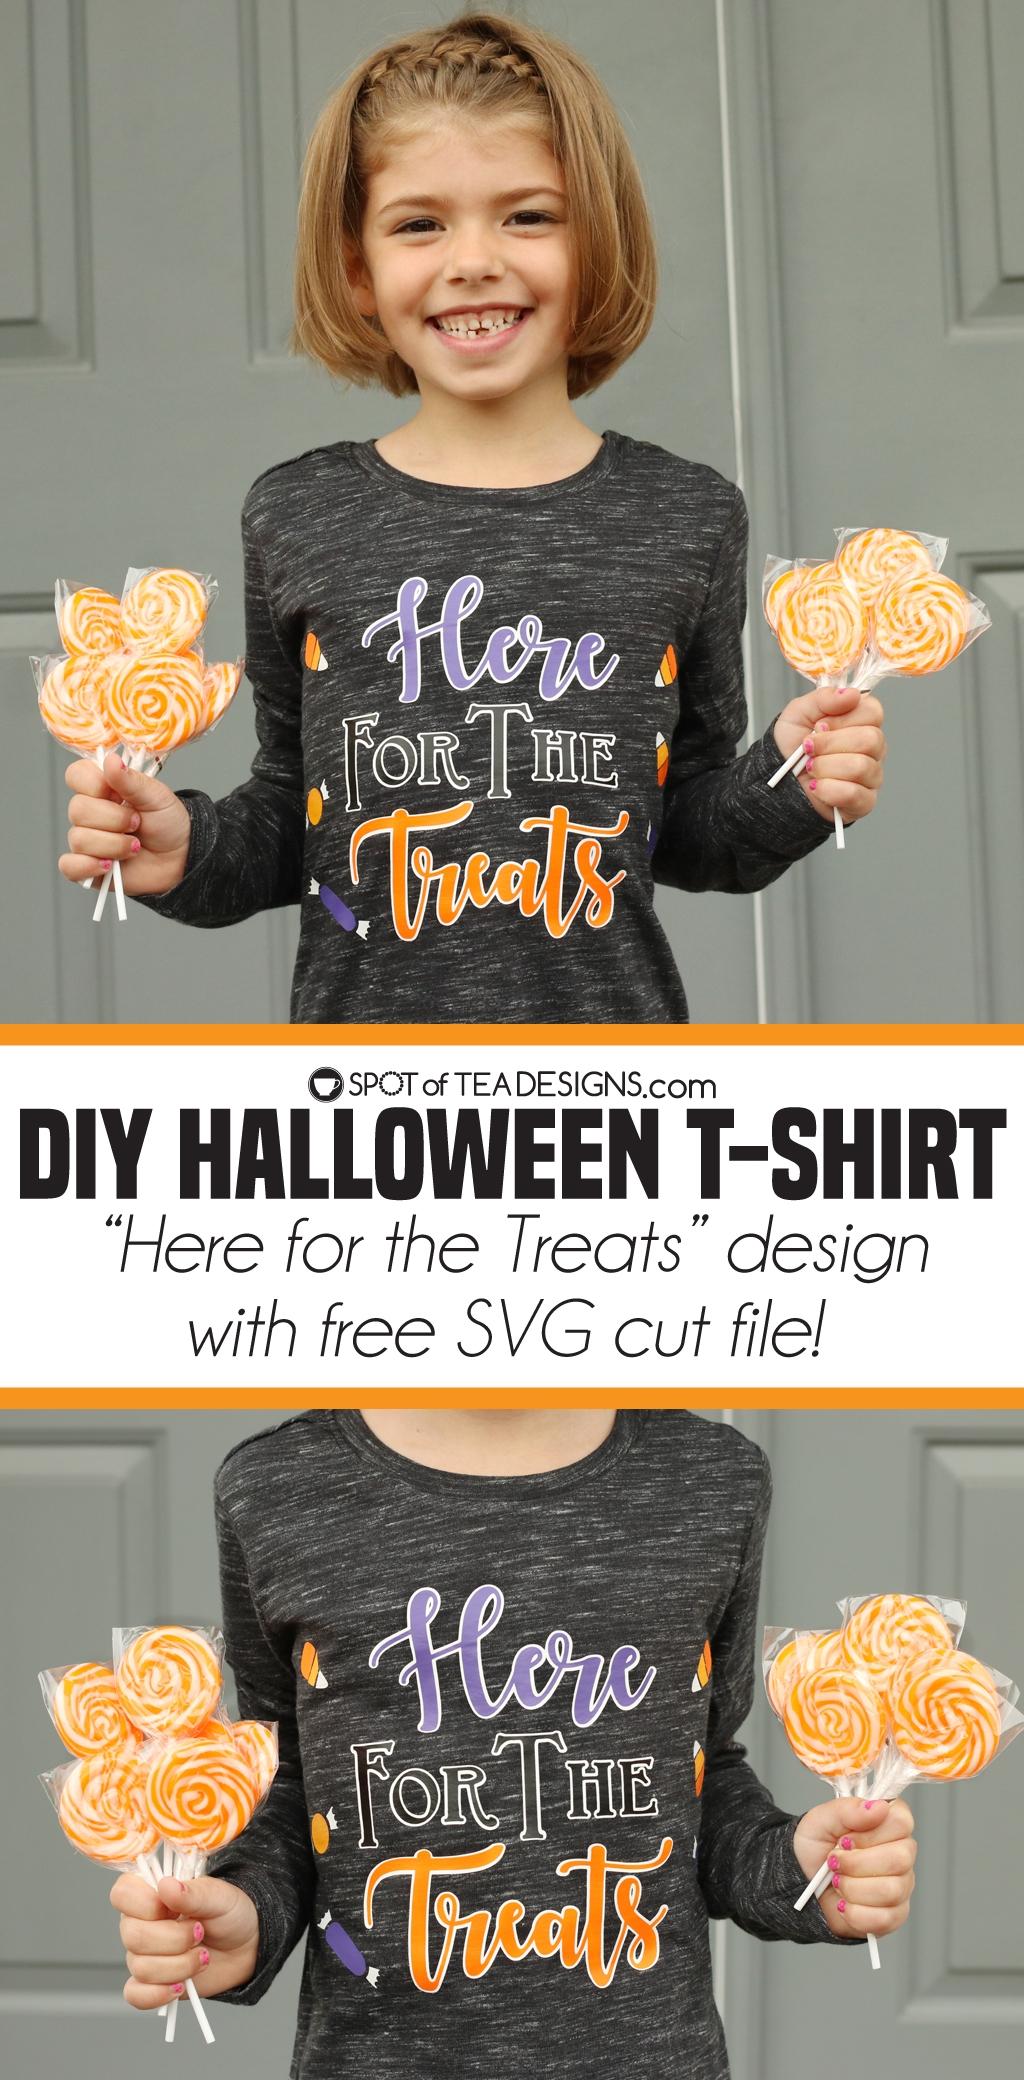 DIY Halloween Tshirt - Here for the treats free svg cut file | spotofteadesigns.com